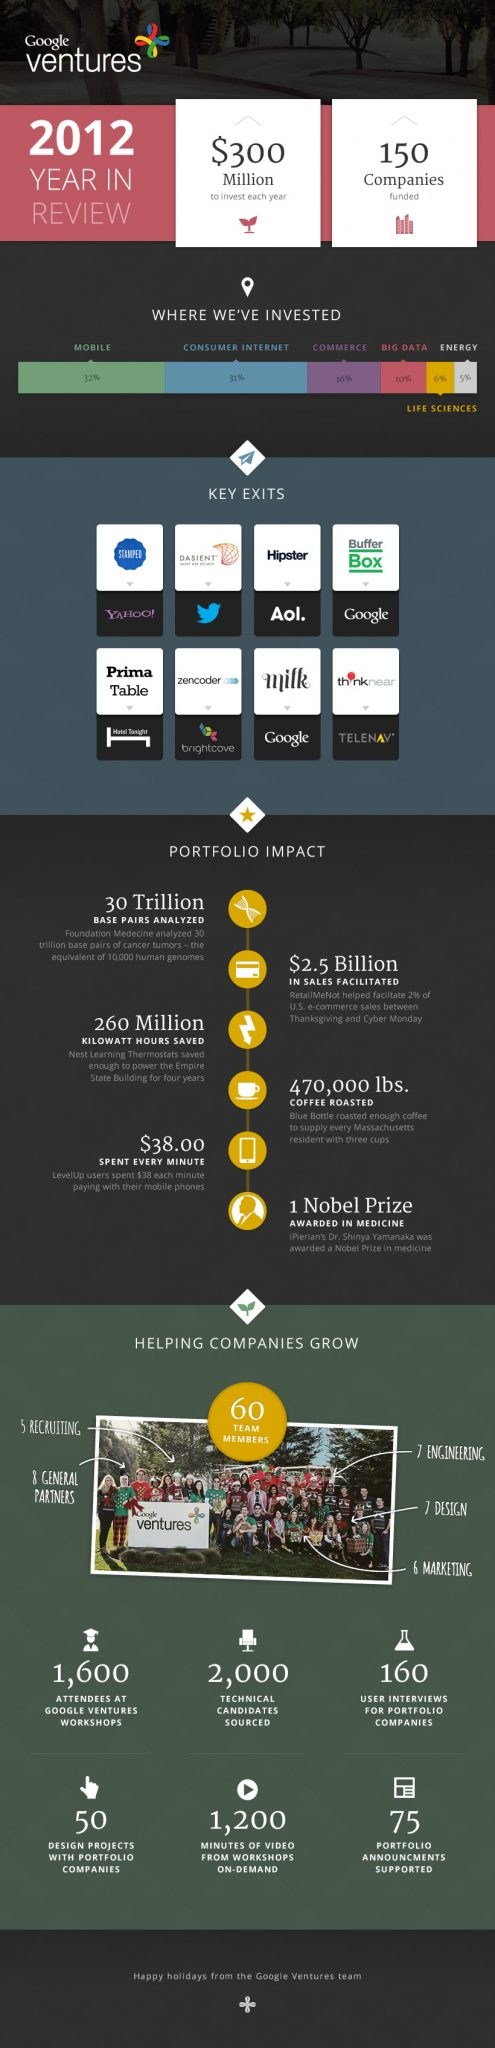 google-venture-2012